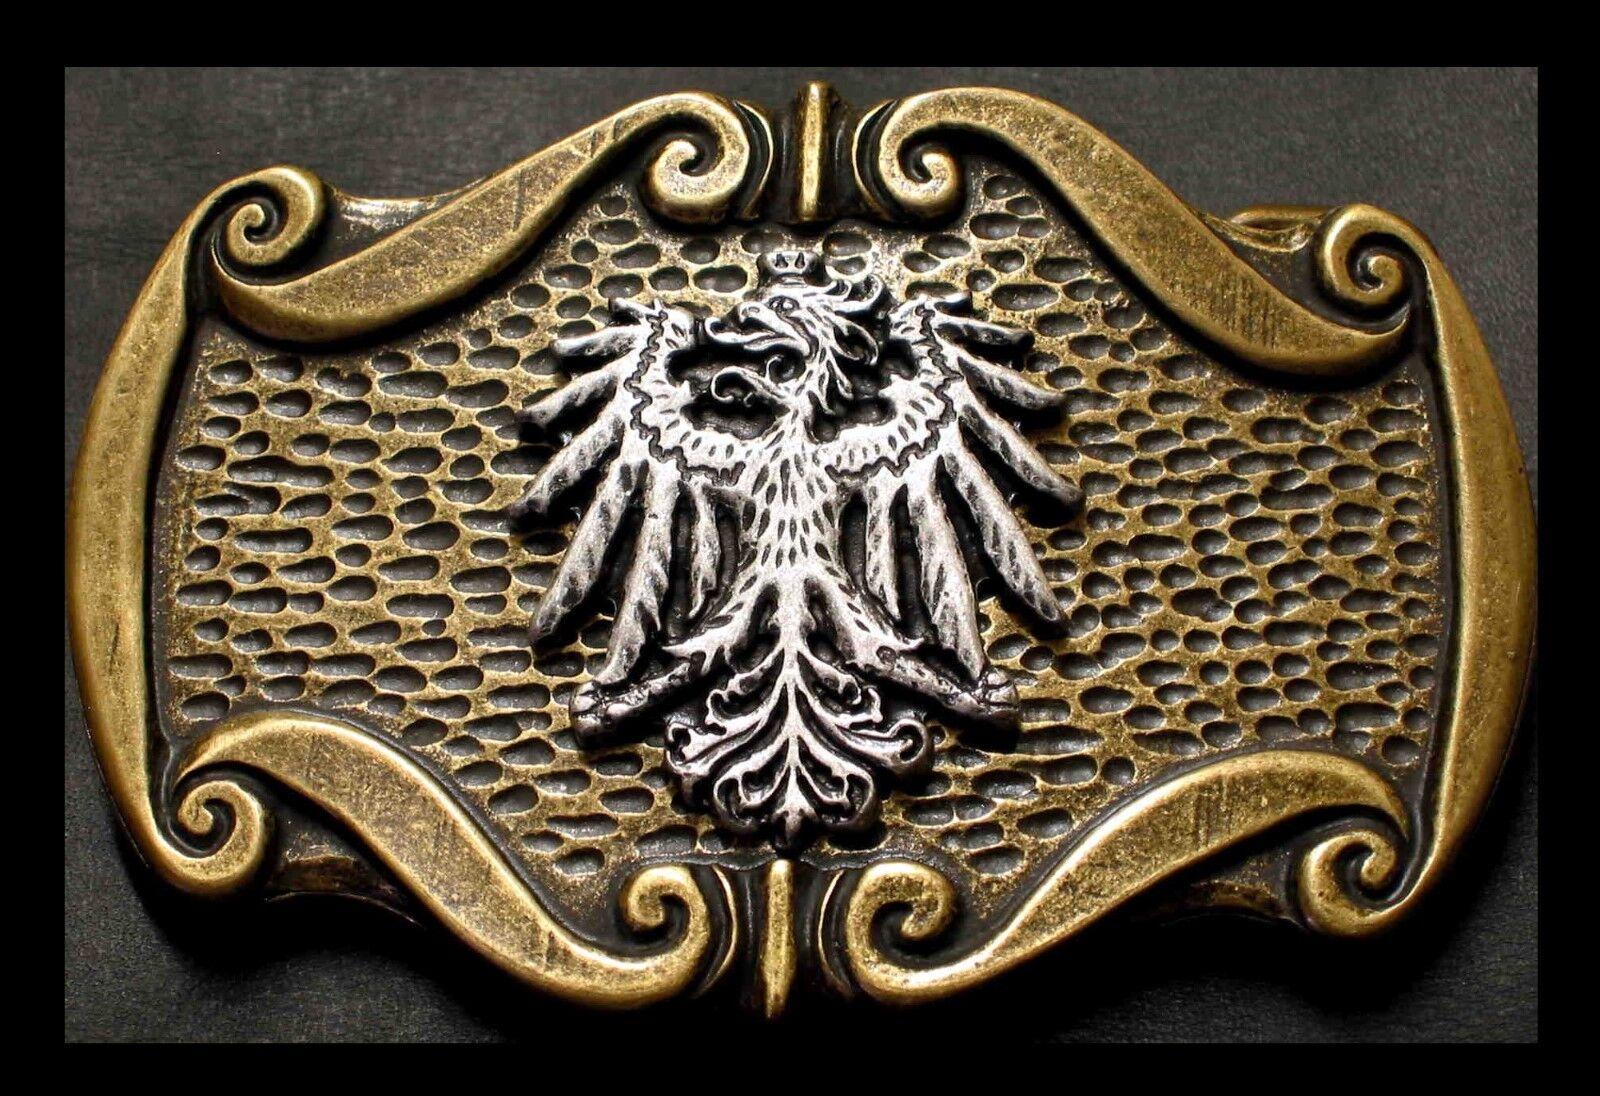 PREMIUM Gürtelschnalle NEU Wappen ALTMESSING Bundesadler ADLER Trachtengürtel #